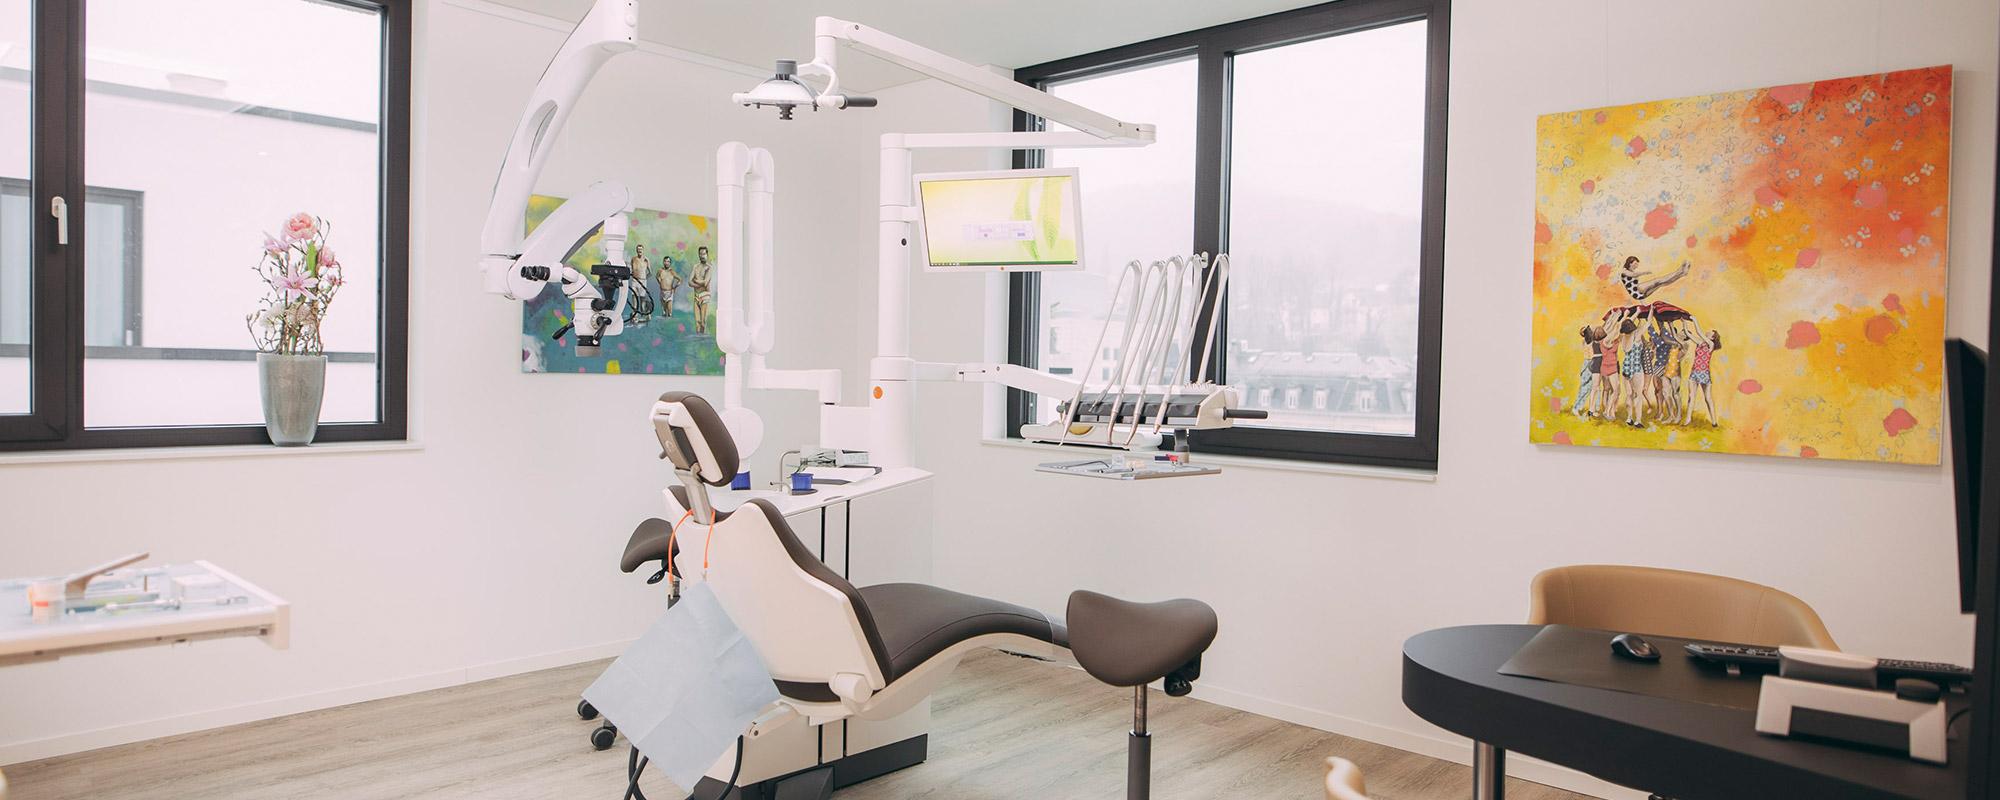 Patienten erwarten angenehme Behandlungszimmer im Medical Center Baden-Baden.